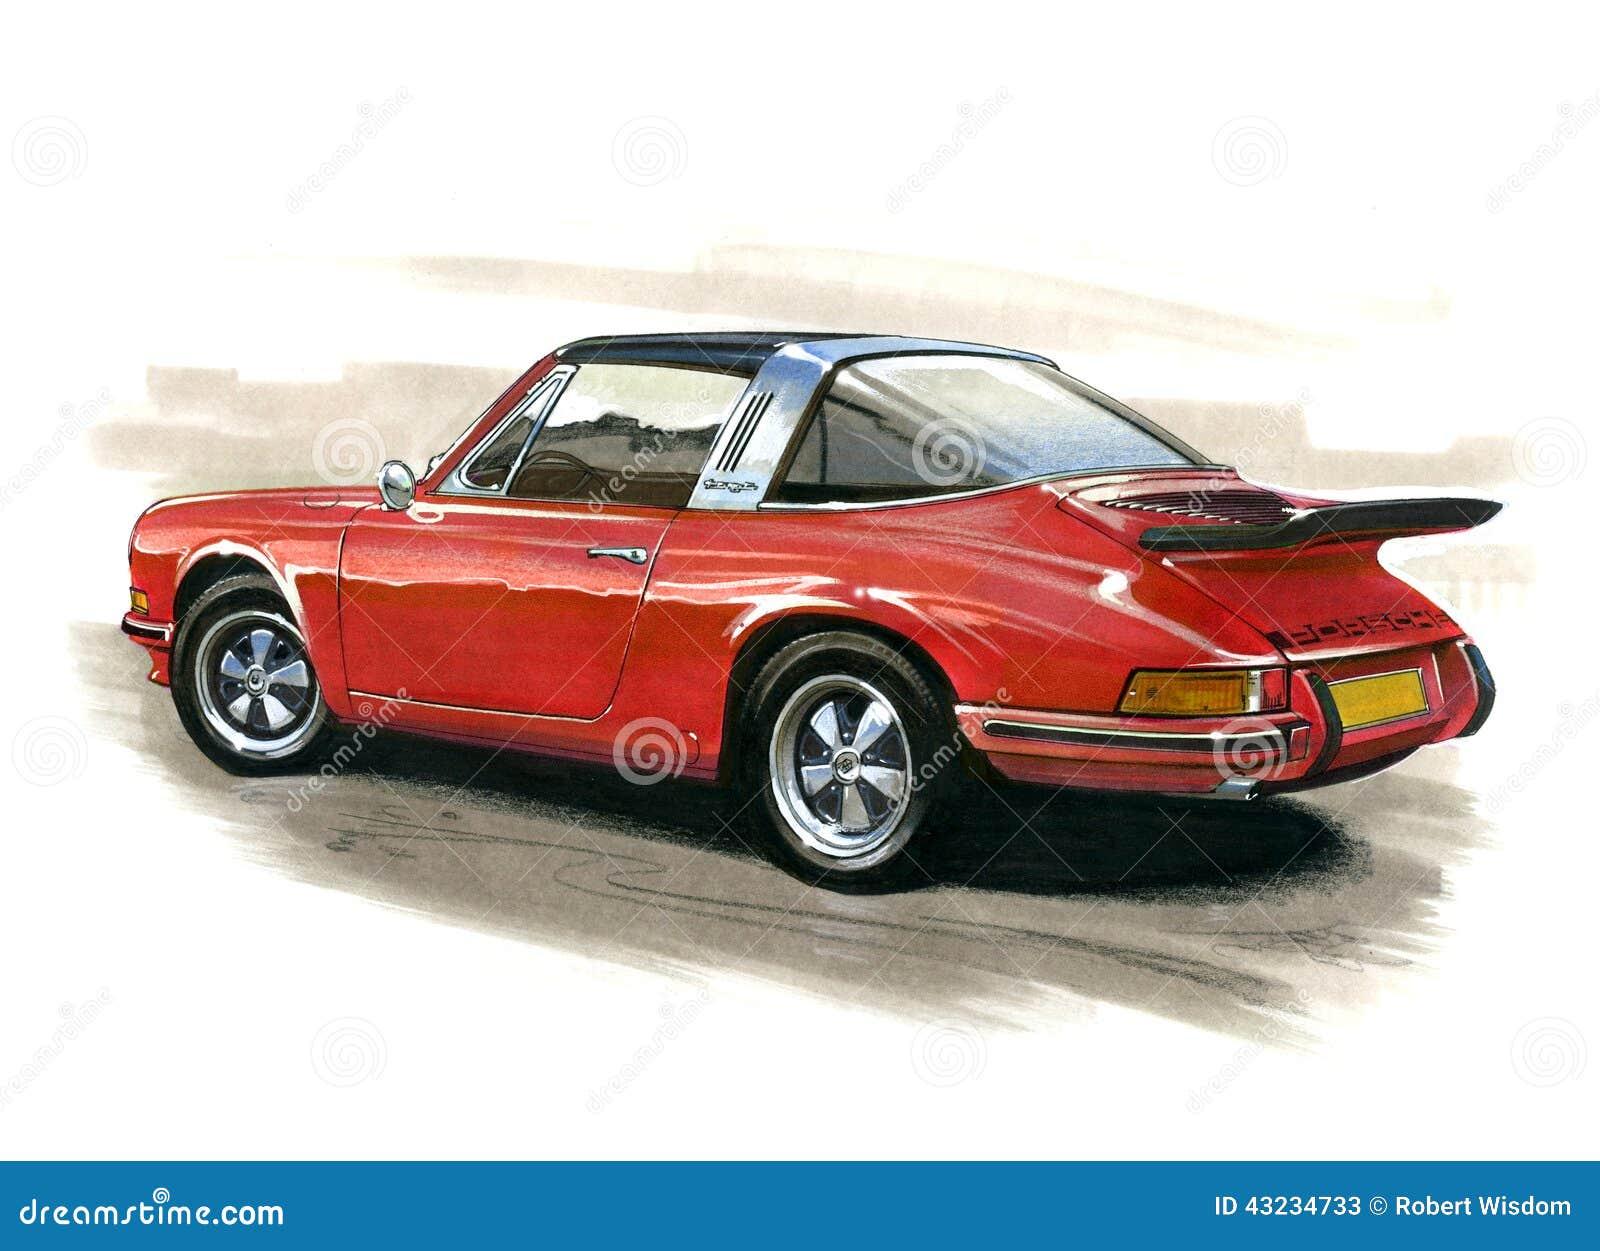 Porsche 911 Targa Editorial Stock Photo Illustration Of Gleaming